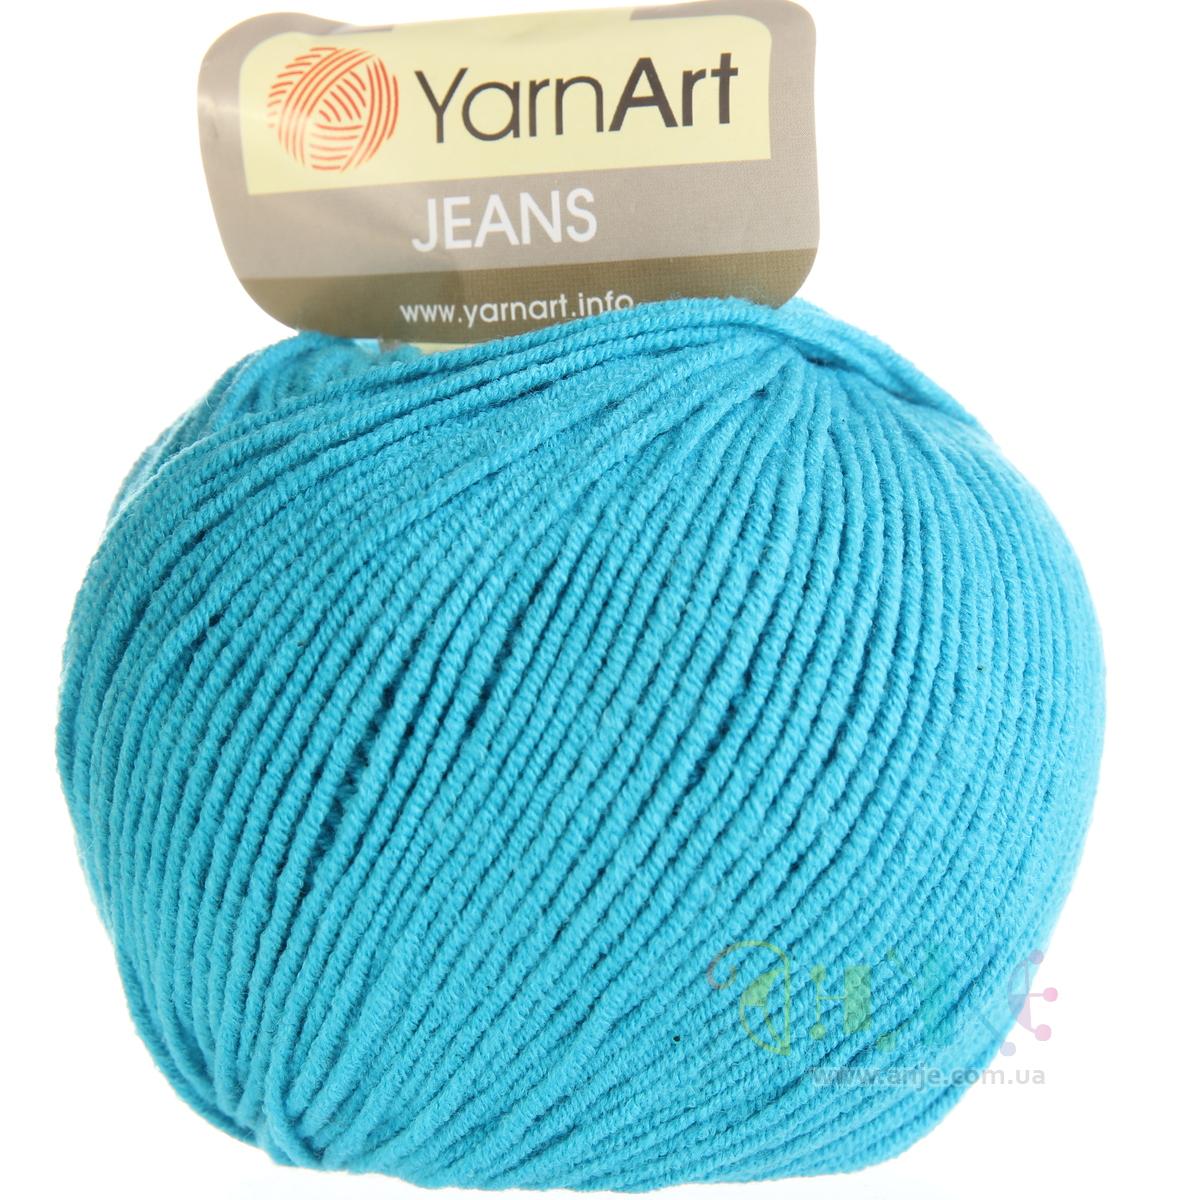 Пряжа Джинс (Jeans) от Yarnart (Турция) - yarni ru